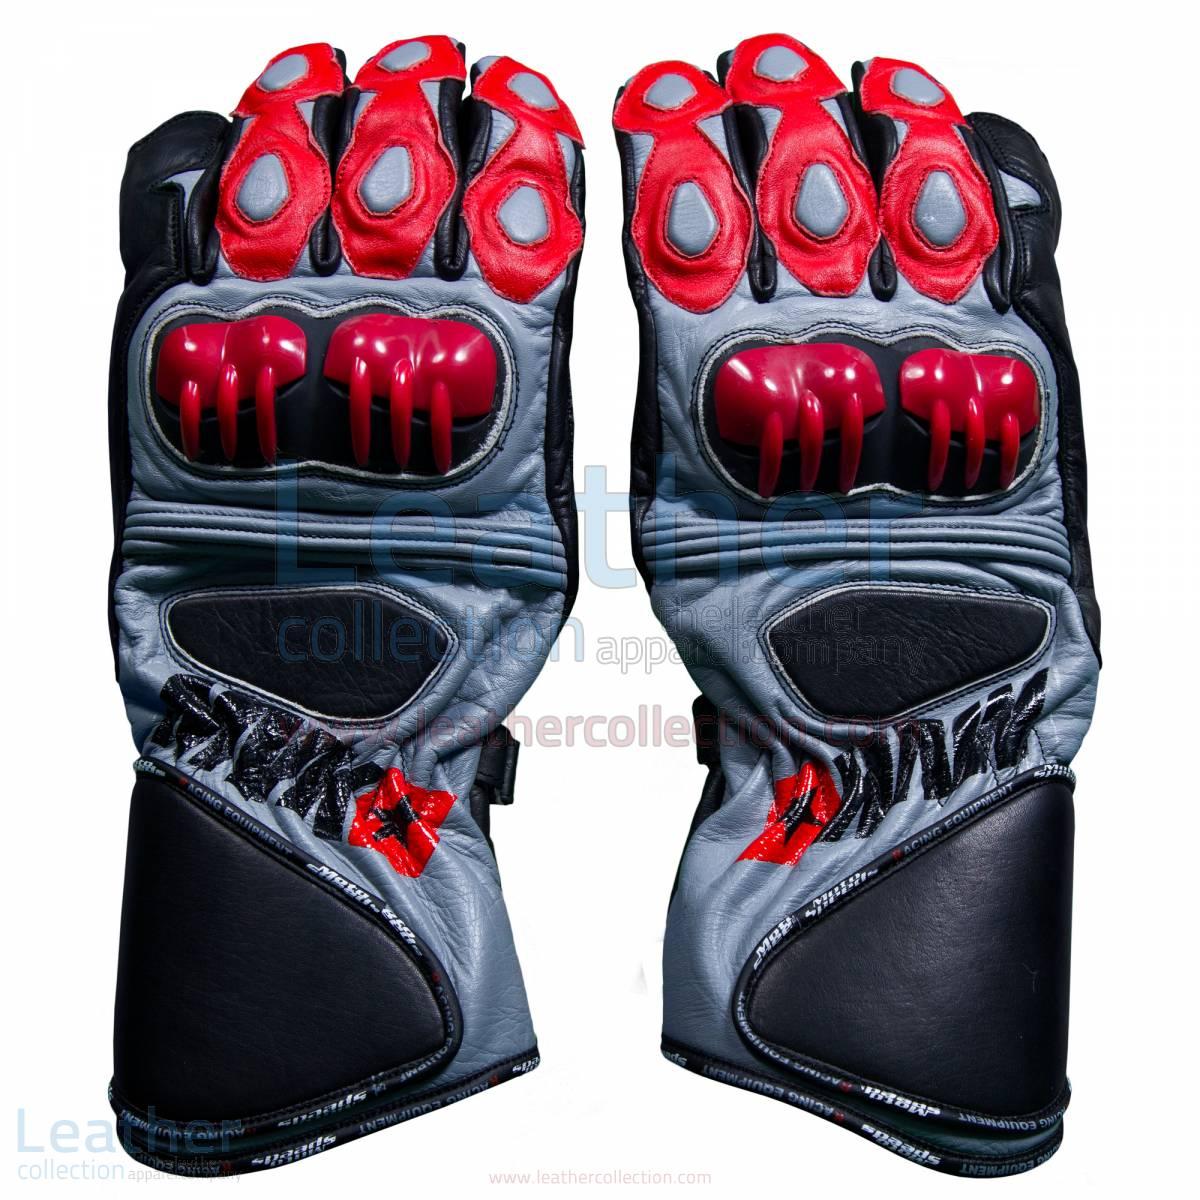 Motogp gloves